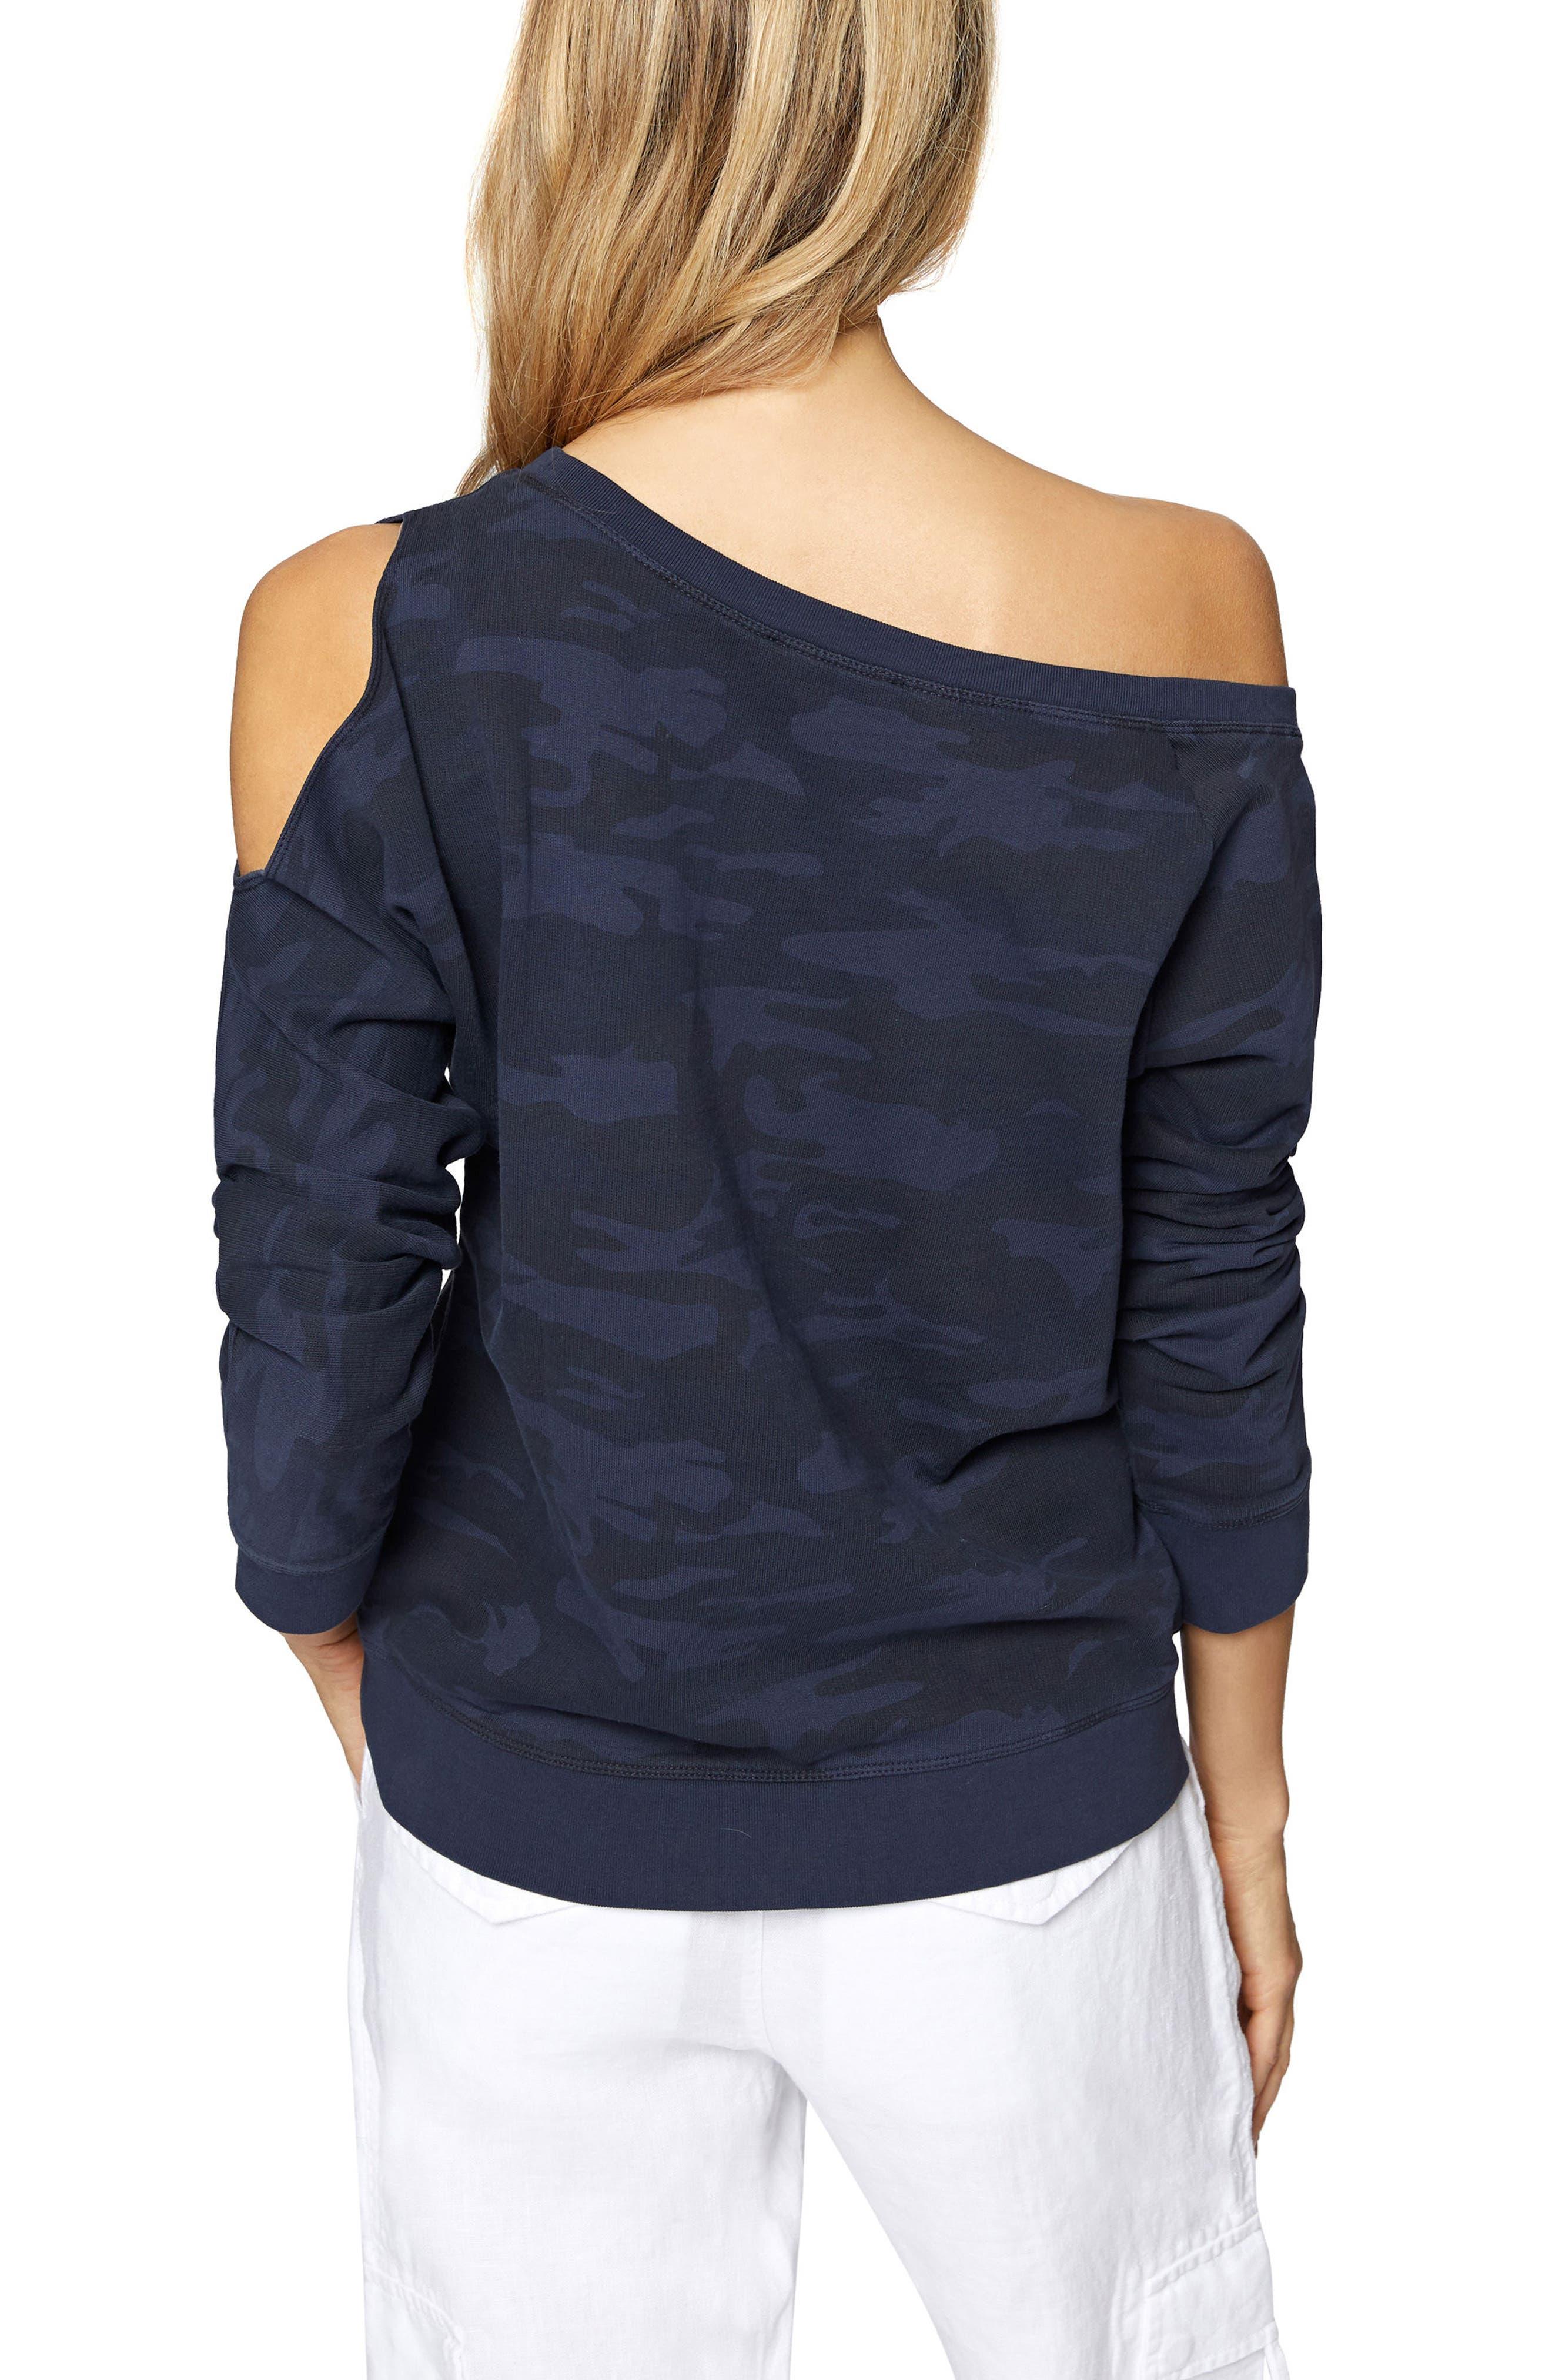 Alexi Asymmetrical Sweatshirt,                             Alternate thumbnail 5, color,